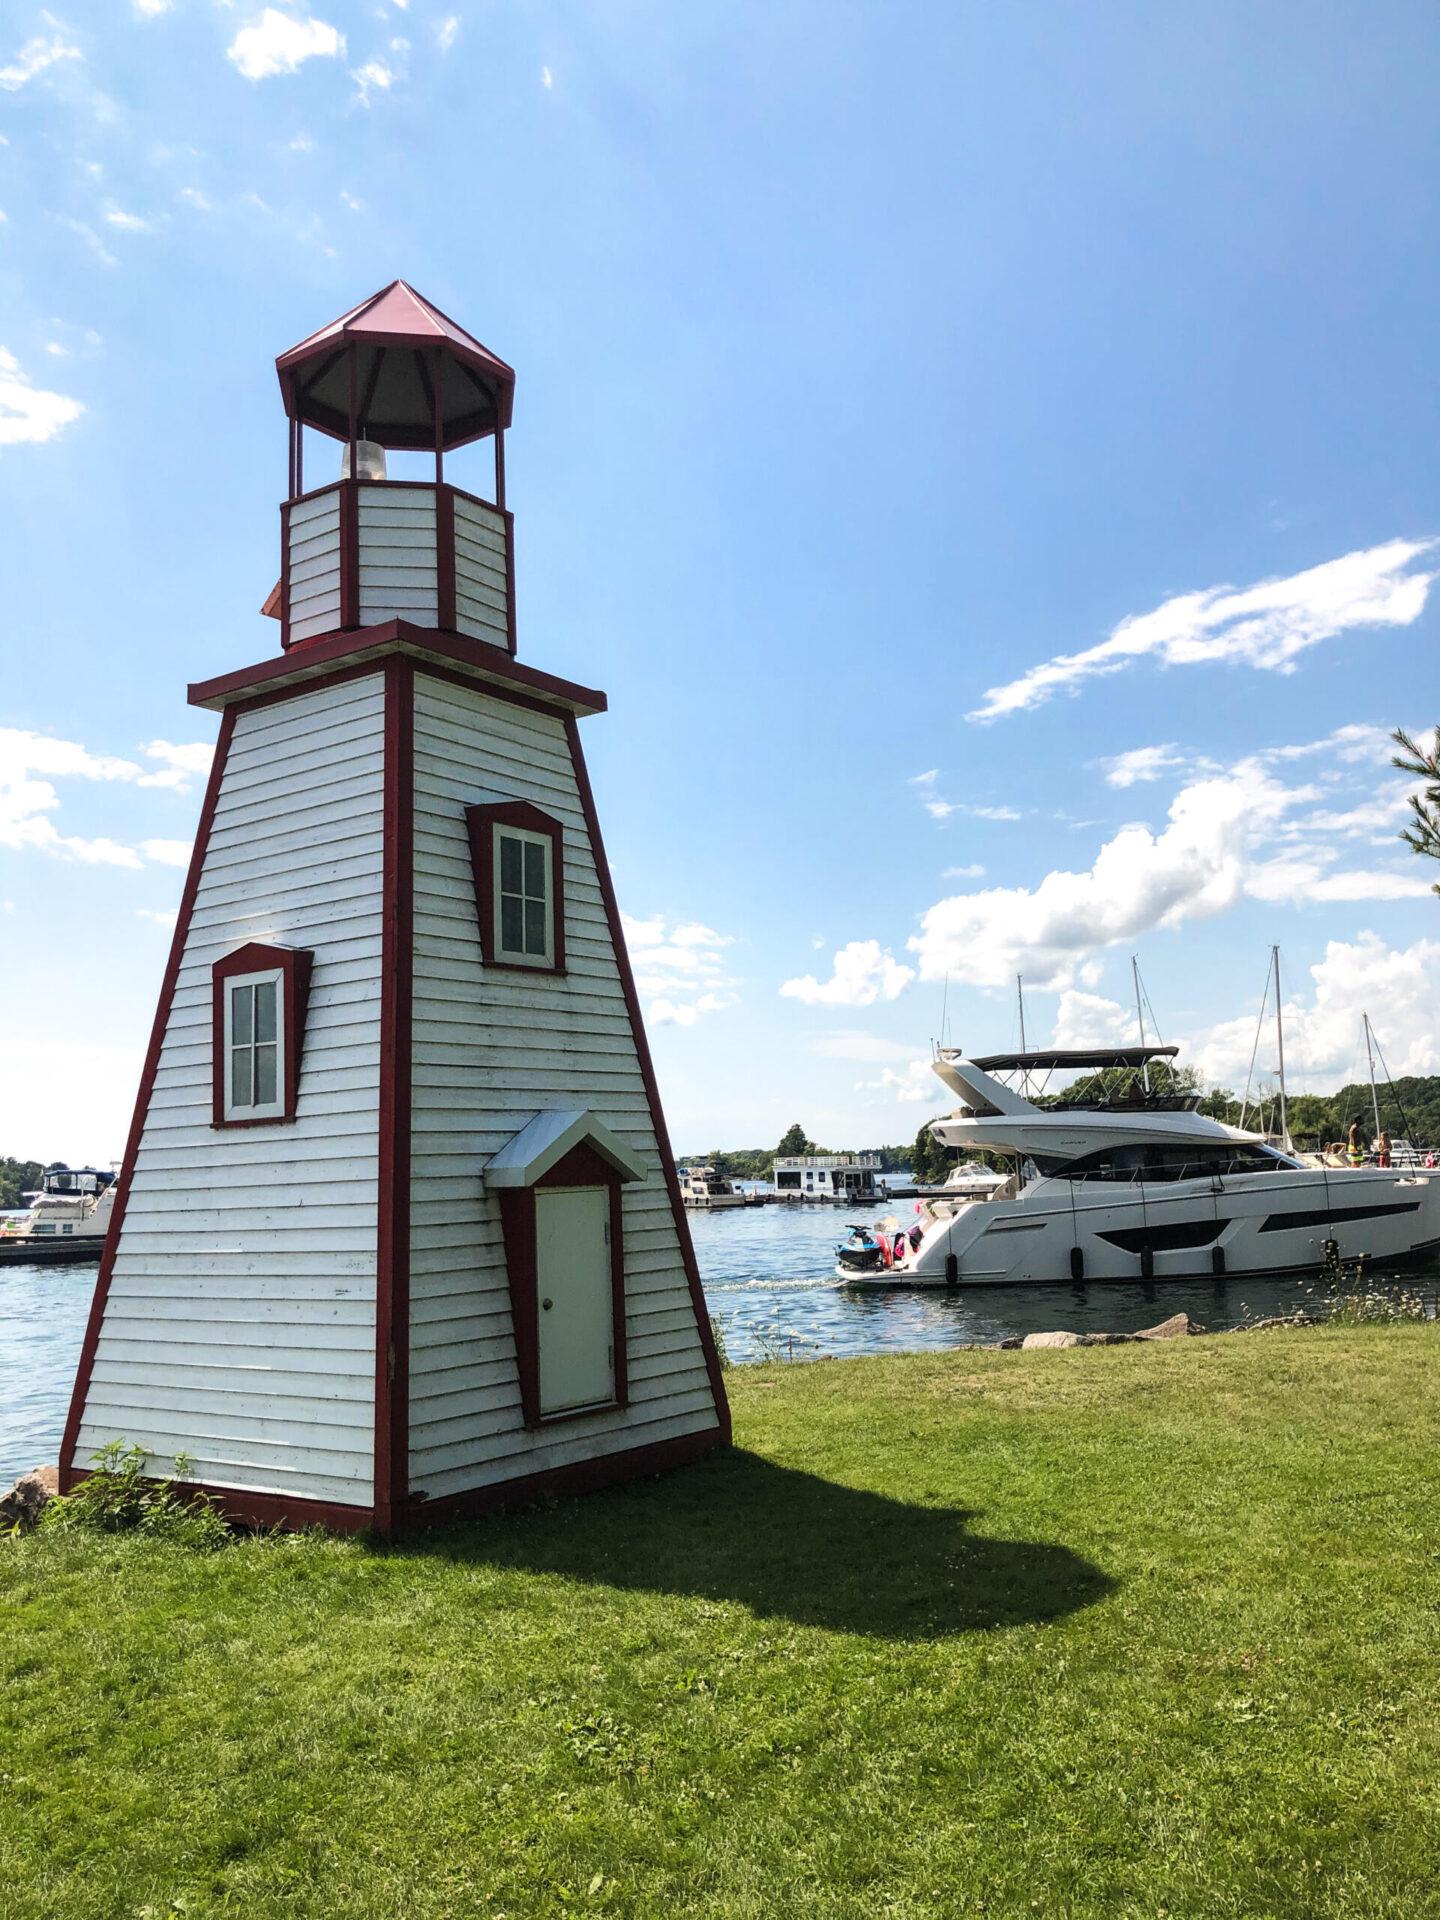 Lighthouse at Joel Stone Park, 1000 Islands